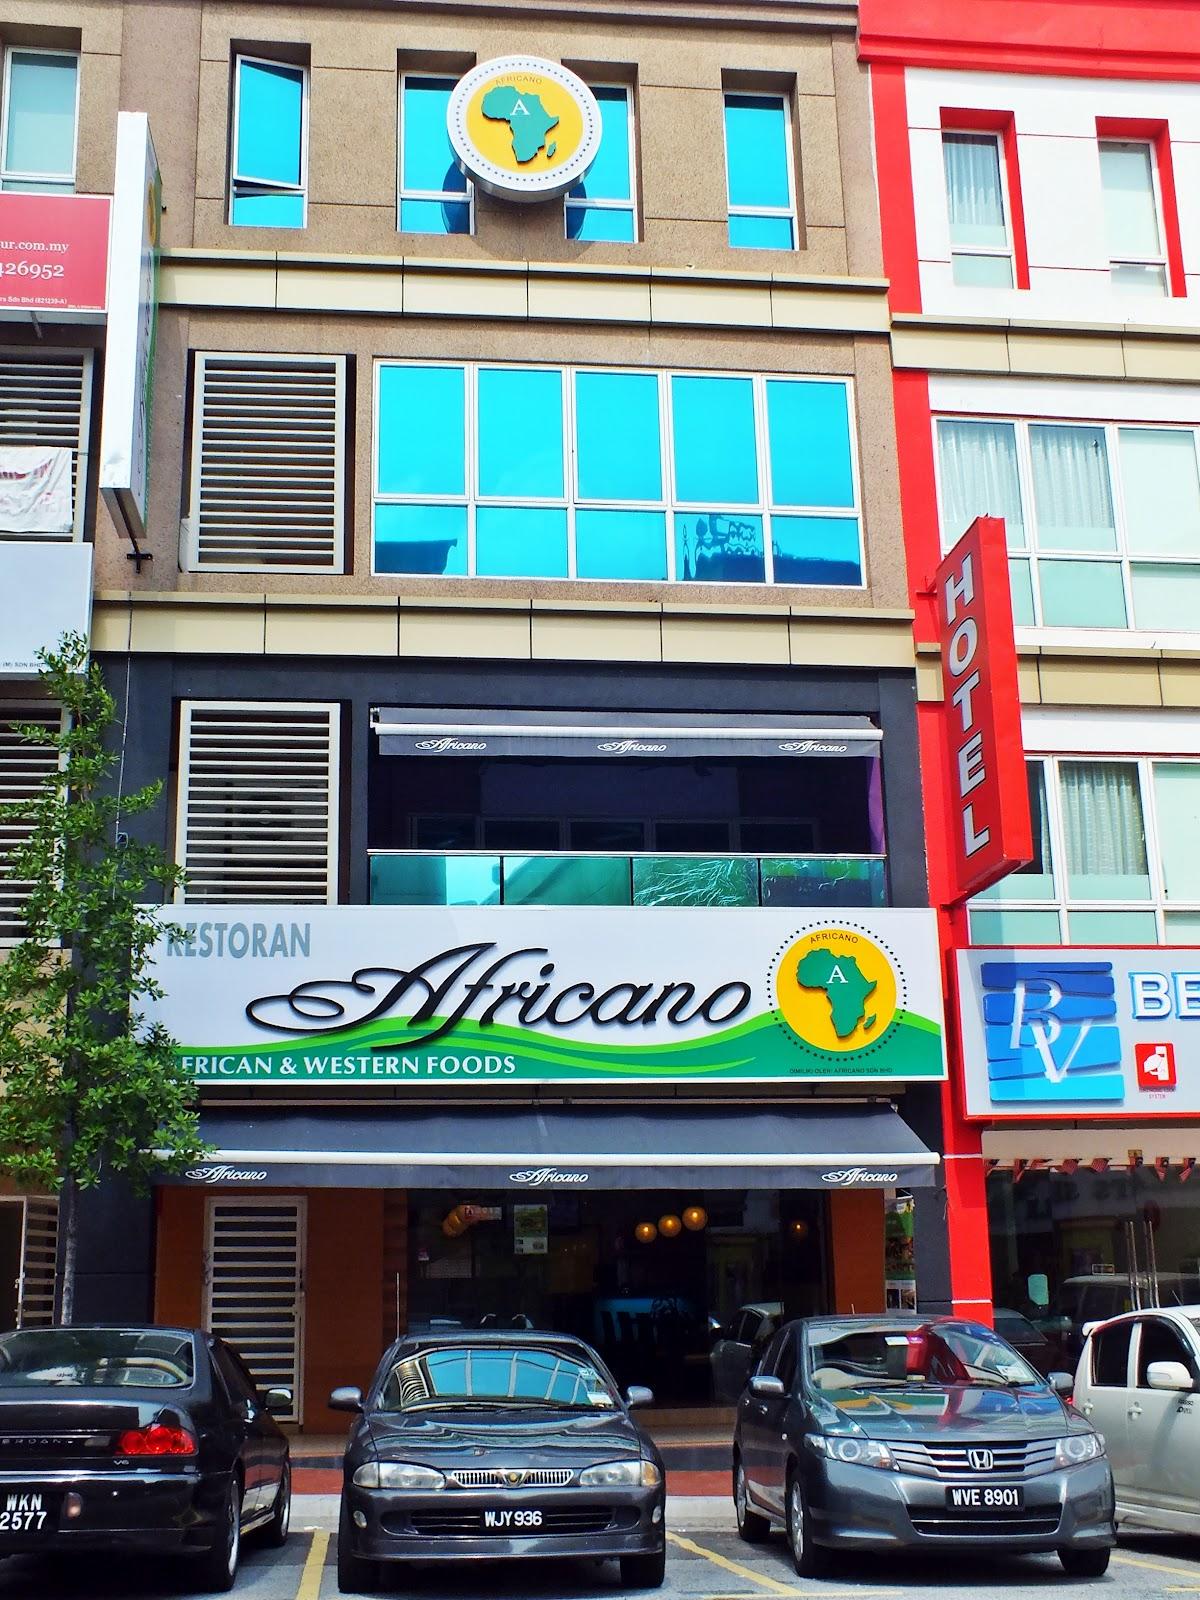 Venoth 39 s culinary adventures africano restaurant bar for Food bar kota damansara